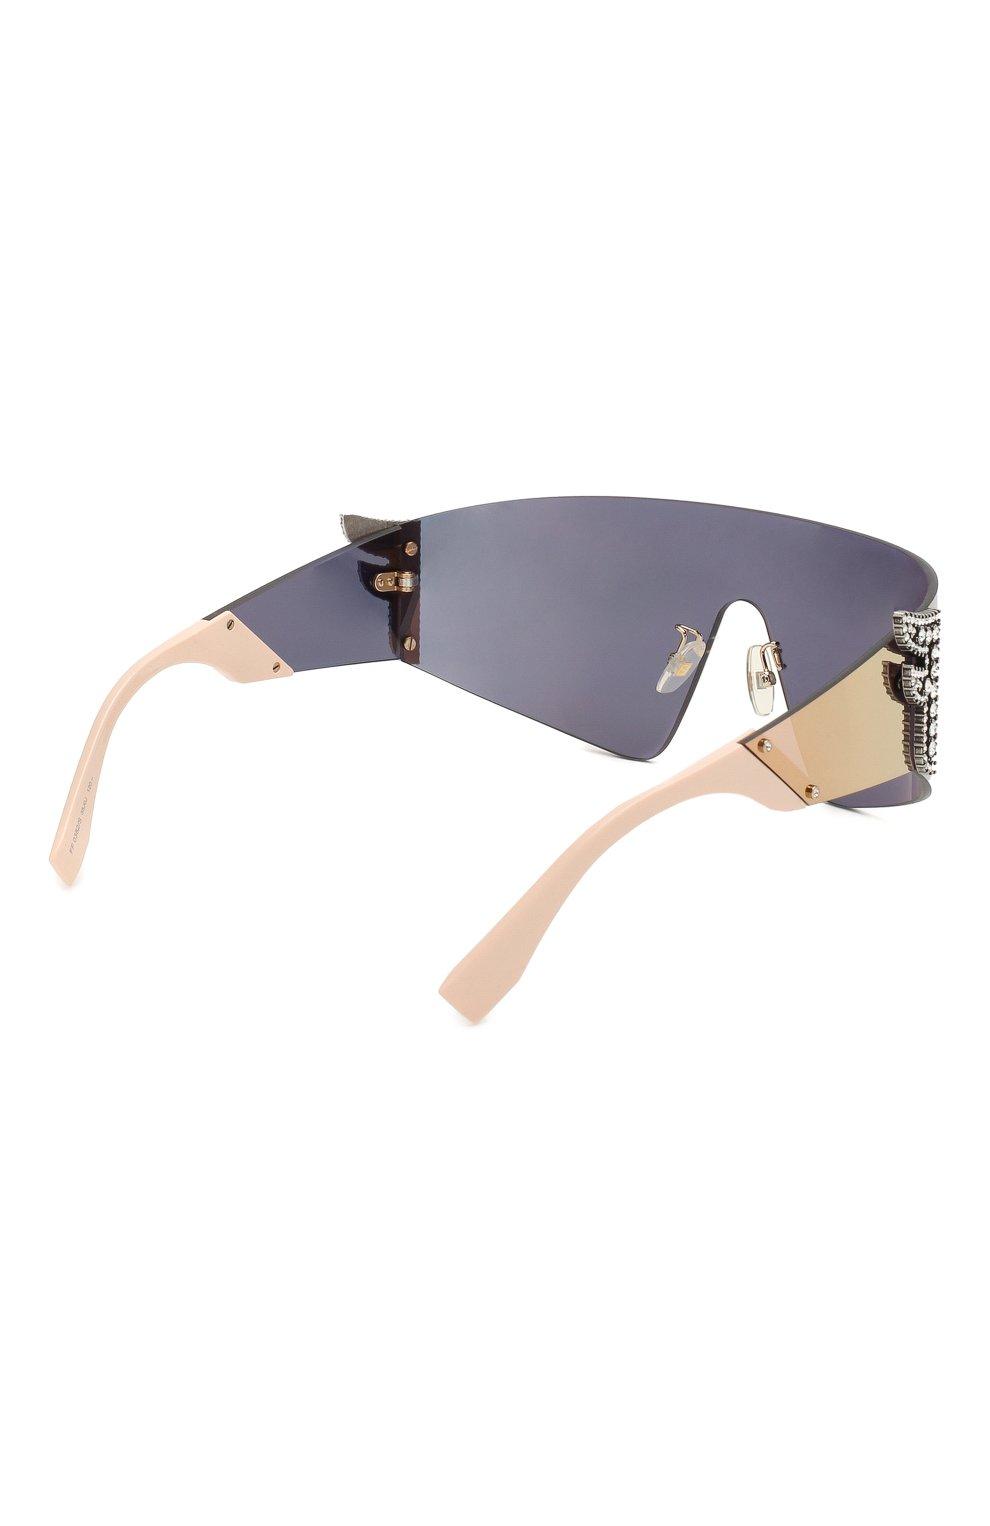 Женские солнцезащитные очки FENDI розового цвета, арт. 0382 35J   Фото 4